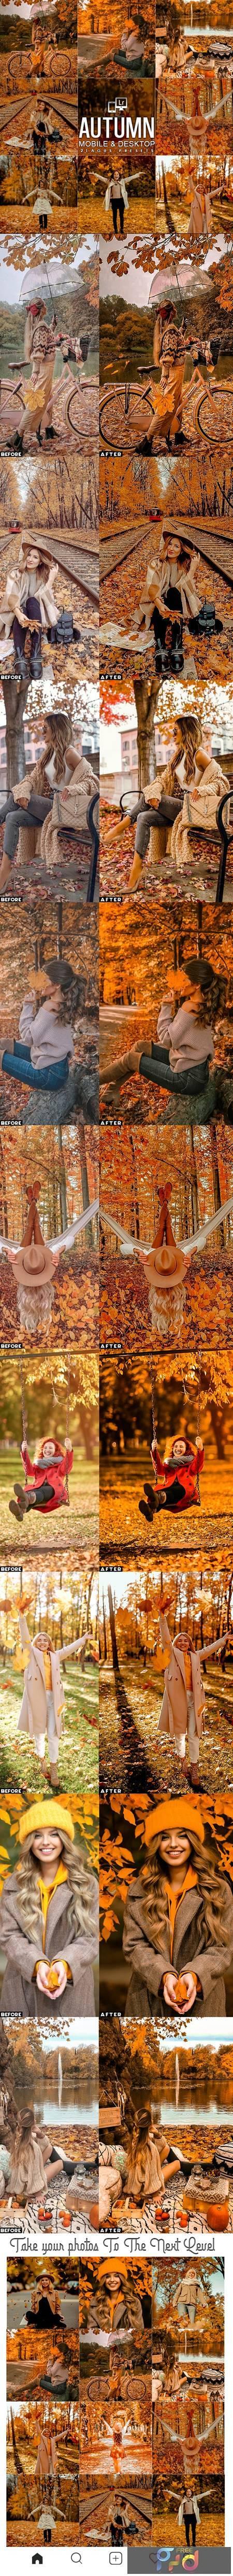 Autumn Lifestyles Lightroom Presets ( mobile and Desktop ) 28885870 1